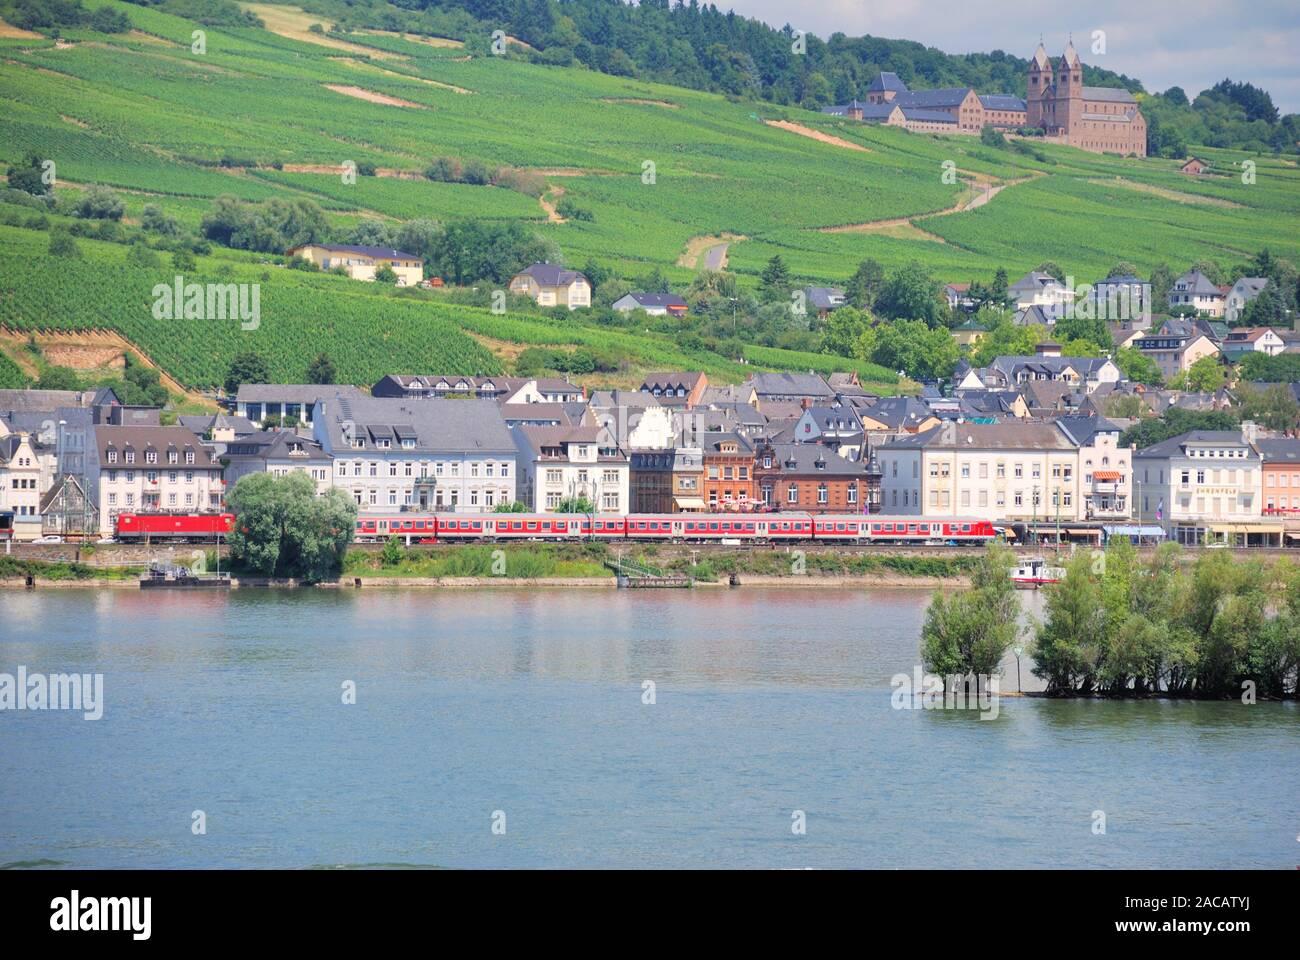 View of Rüdesheim and the monastery Sankt Hildegard, Romantic Rhine Valley, UNESCO World Heritage Upper Middle Rhine Valley Stock Photo